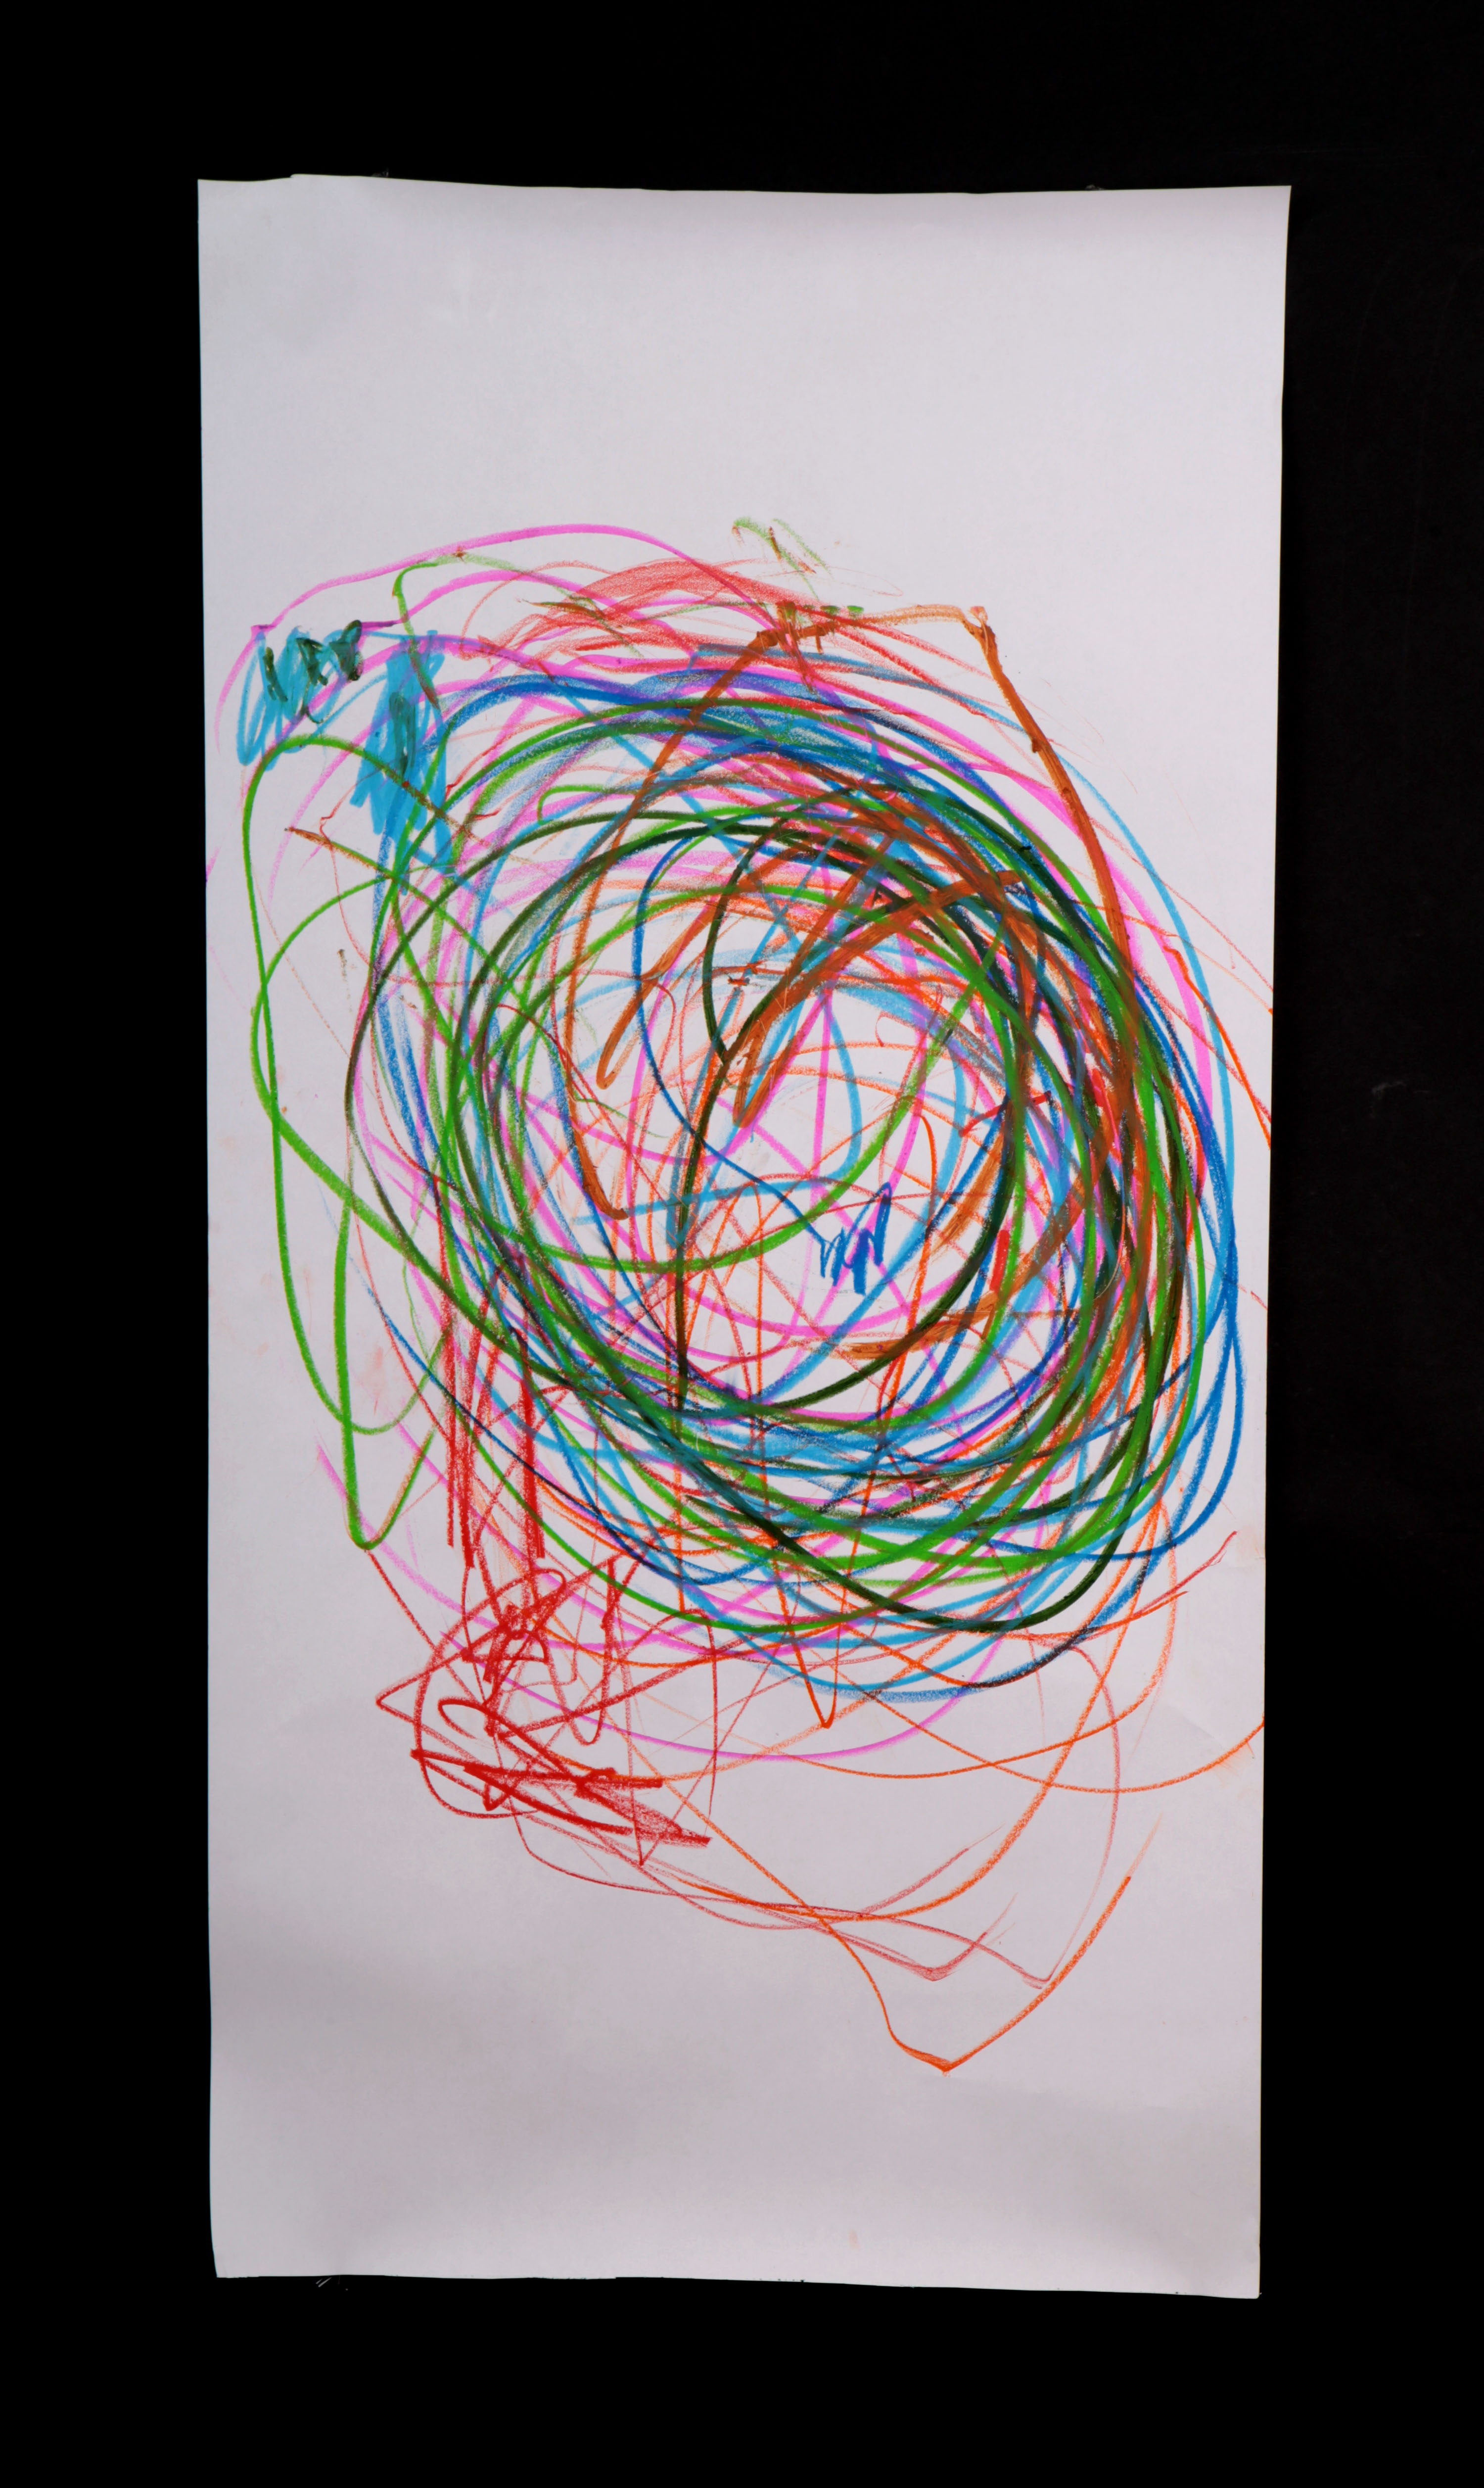 Art by Anastasia. Untitled #75. Gel sticks on paper.